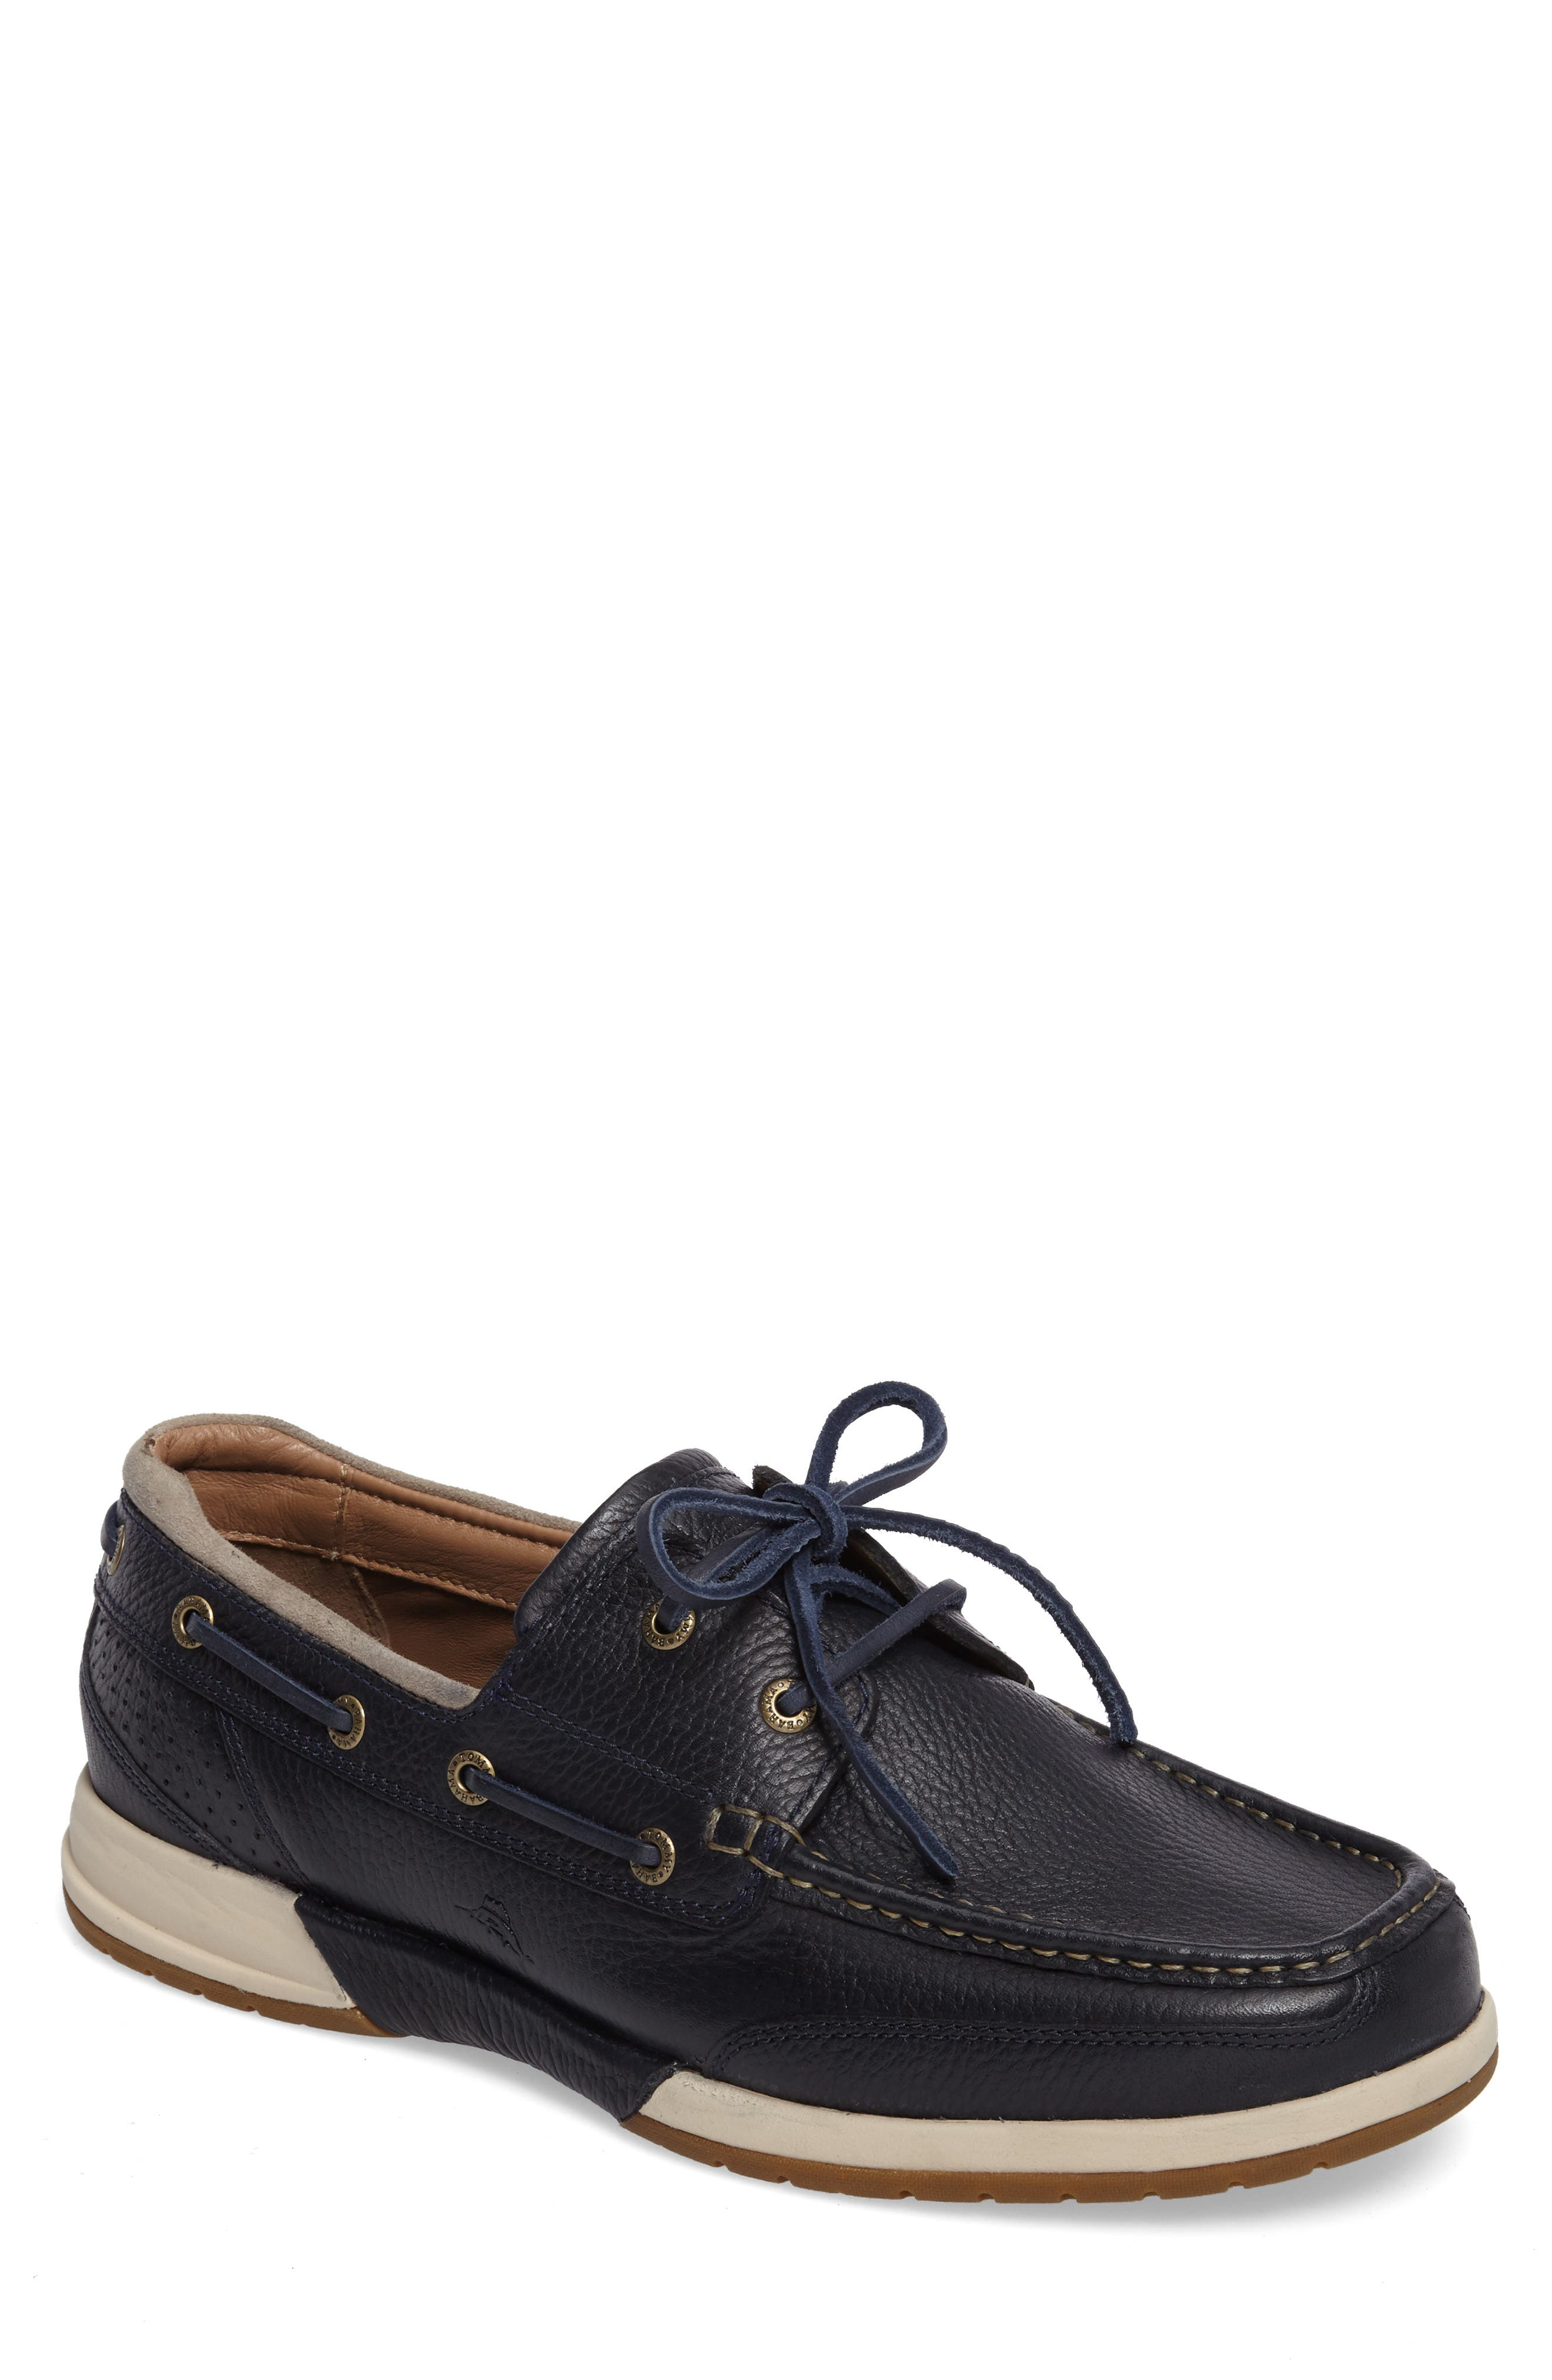 Alternate Image 1 Selected - Tommy Bahama Ashore Thing Boat Shoe (Men)